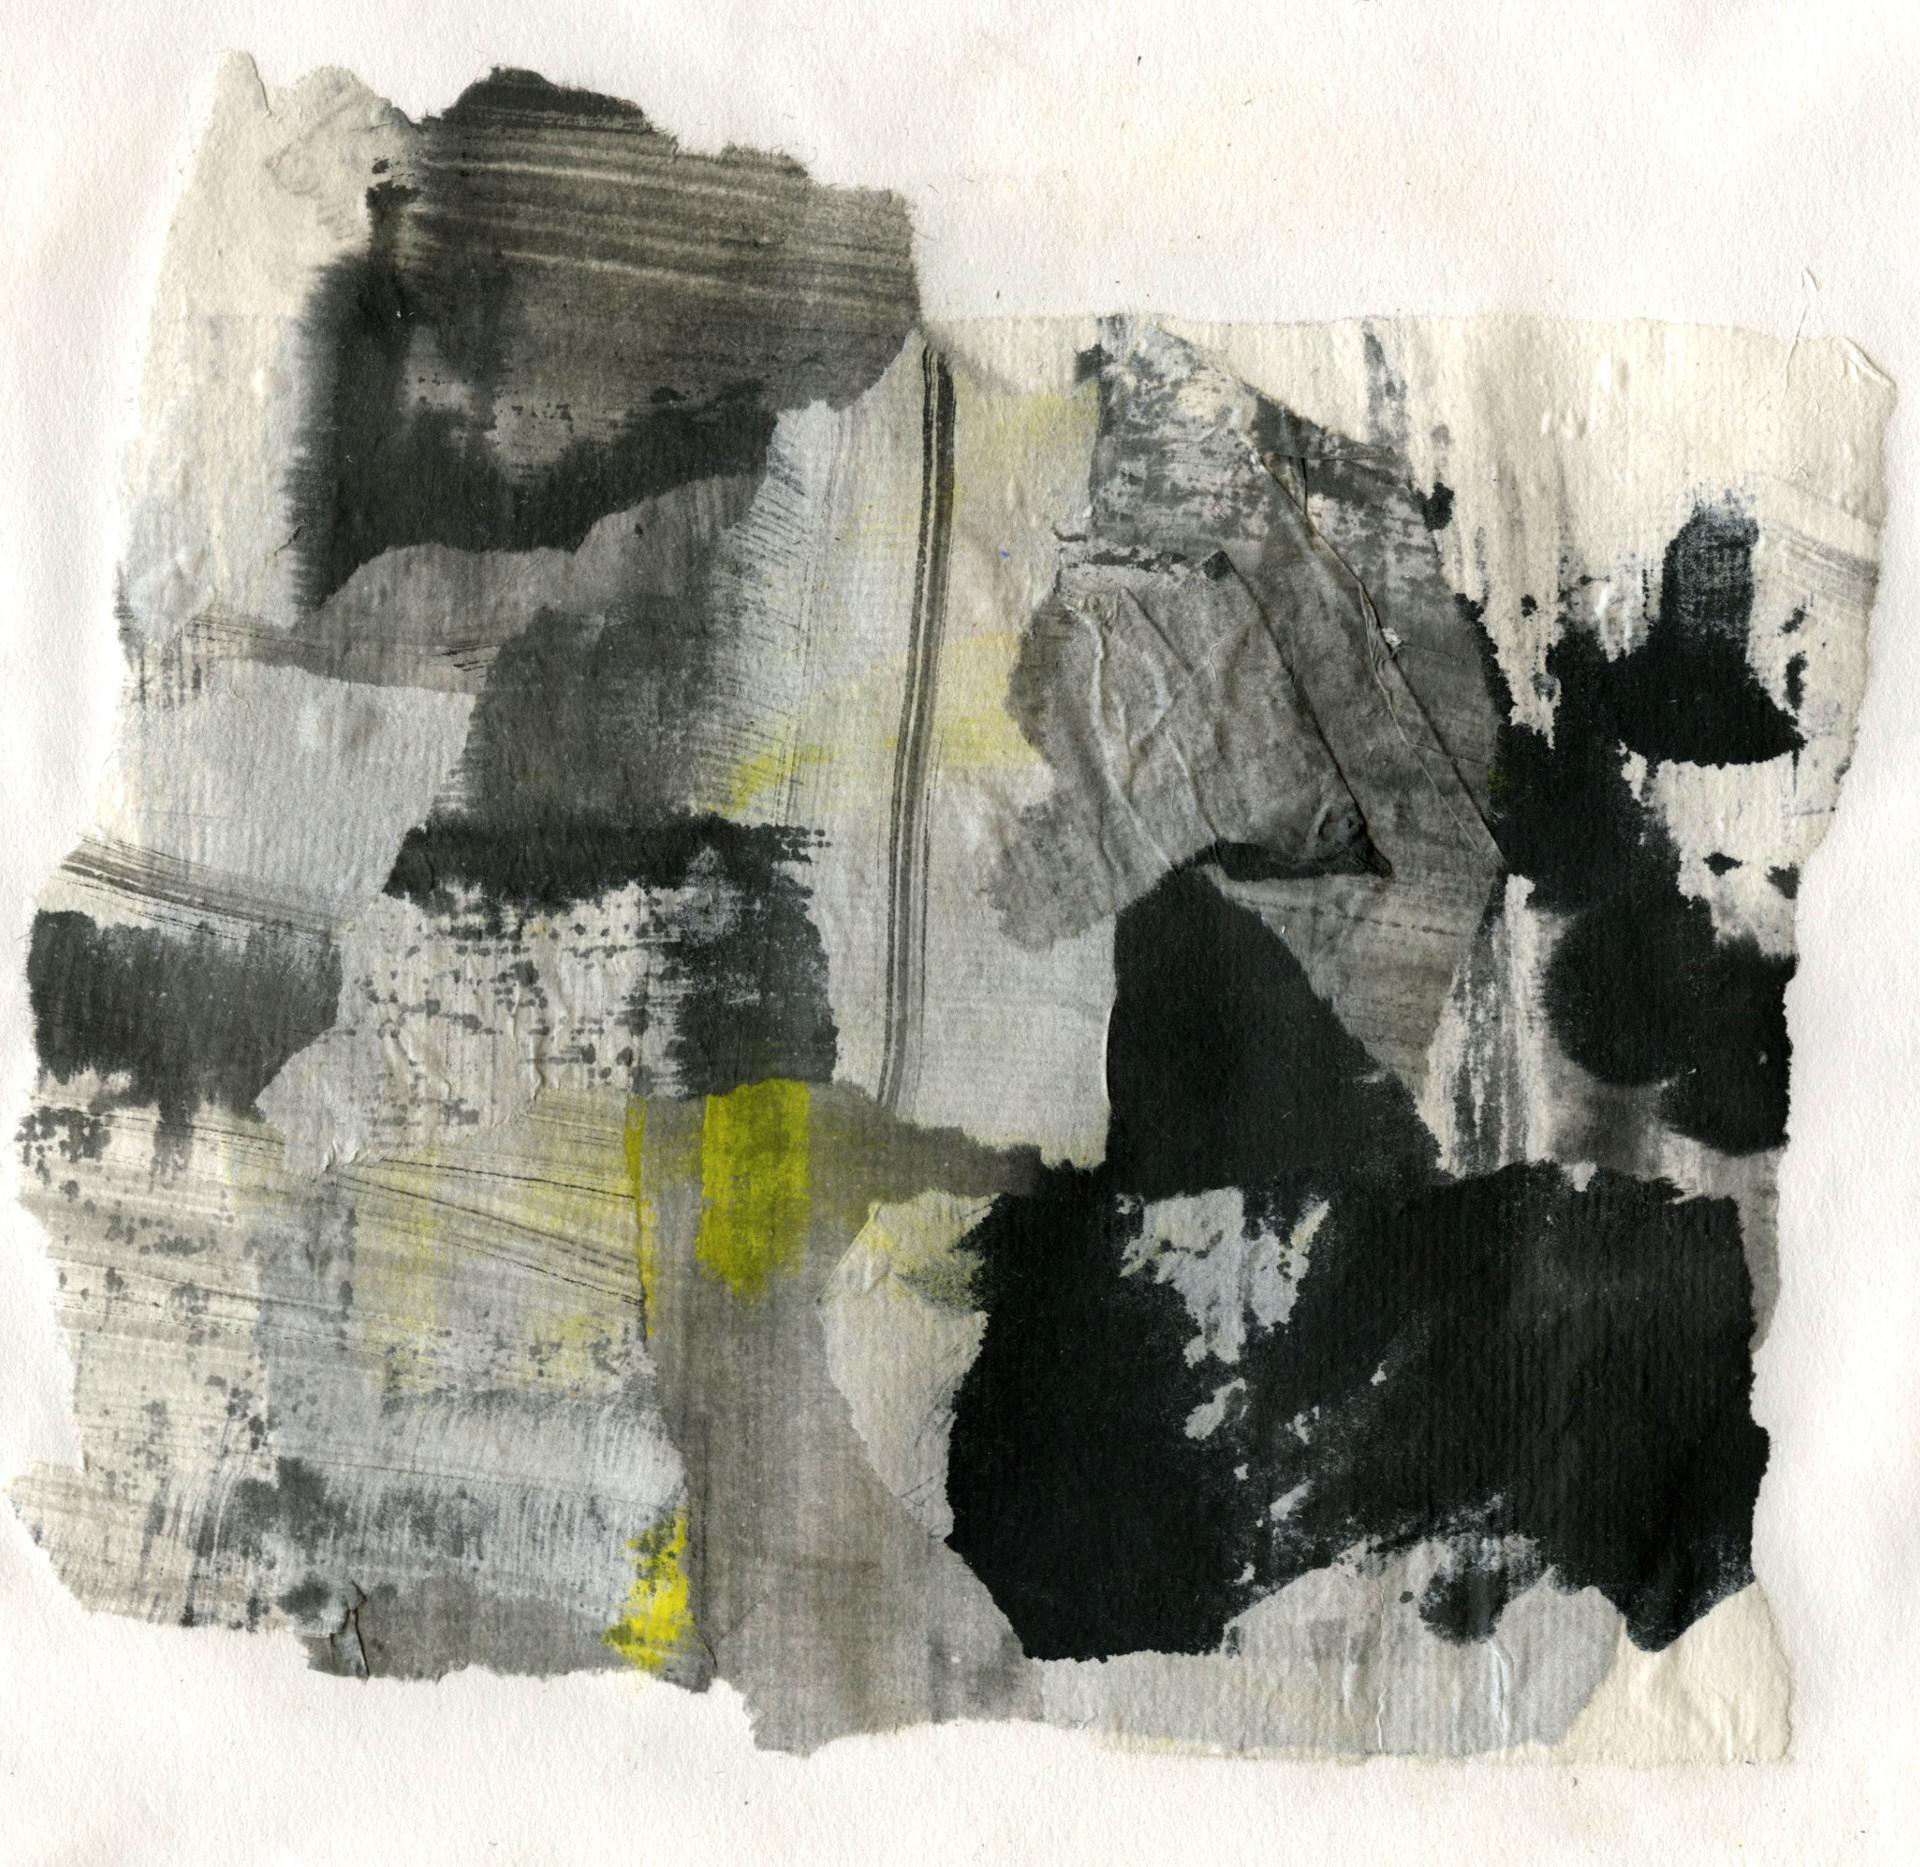 """Yellow bridge series II"" / 2013 / Ink on paper"